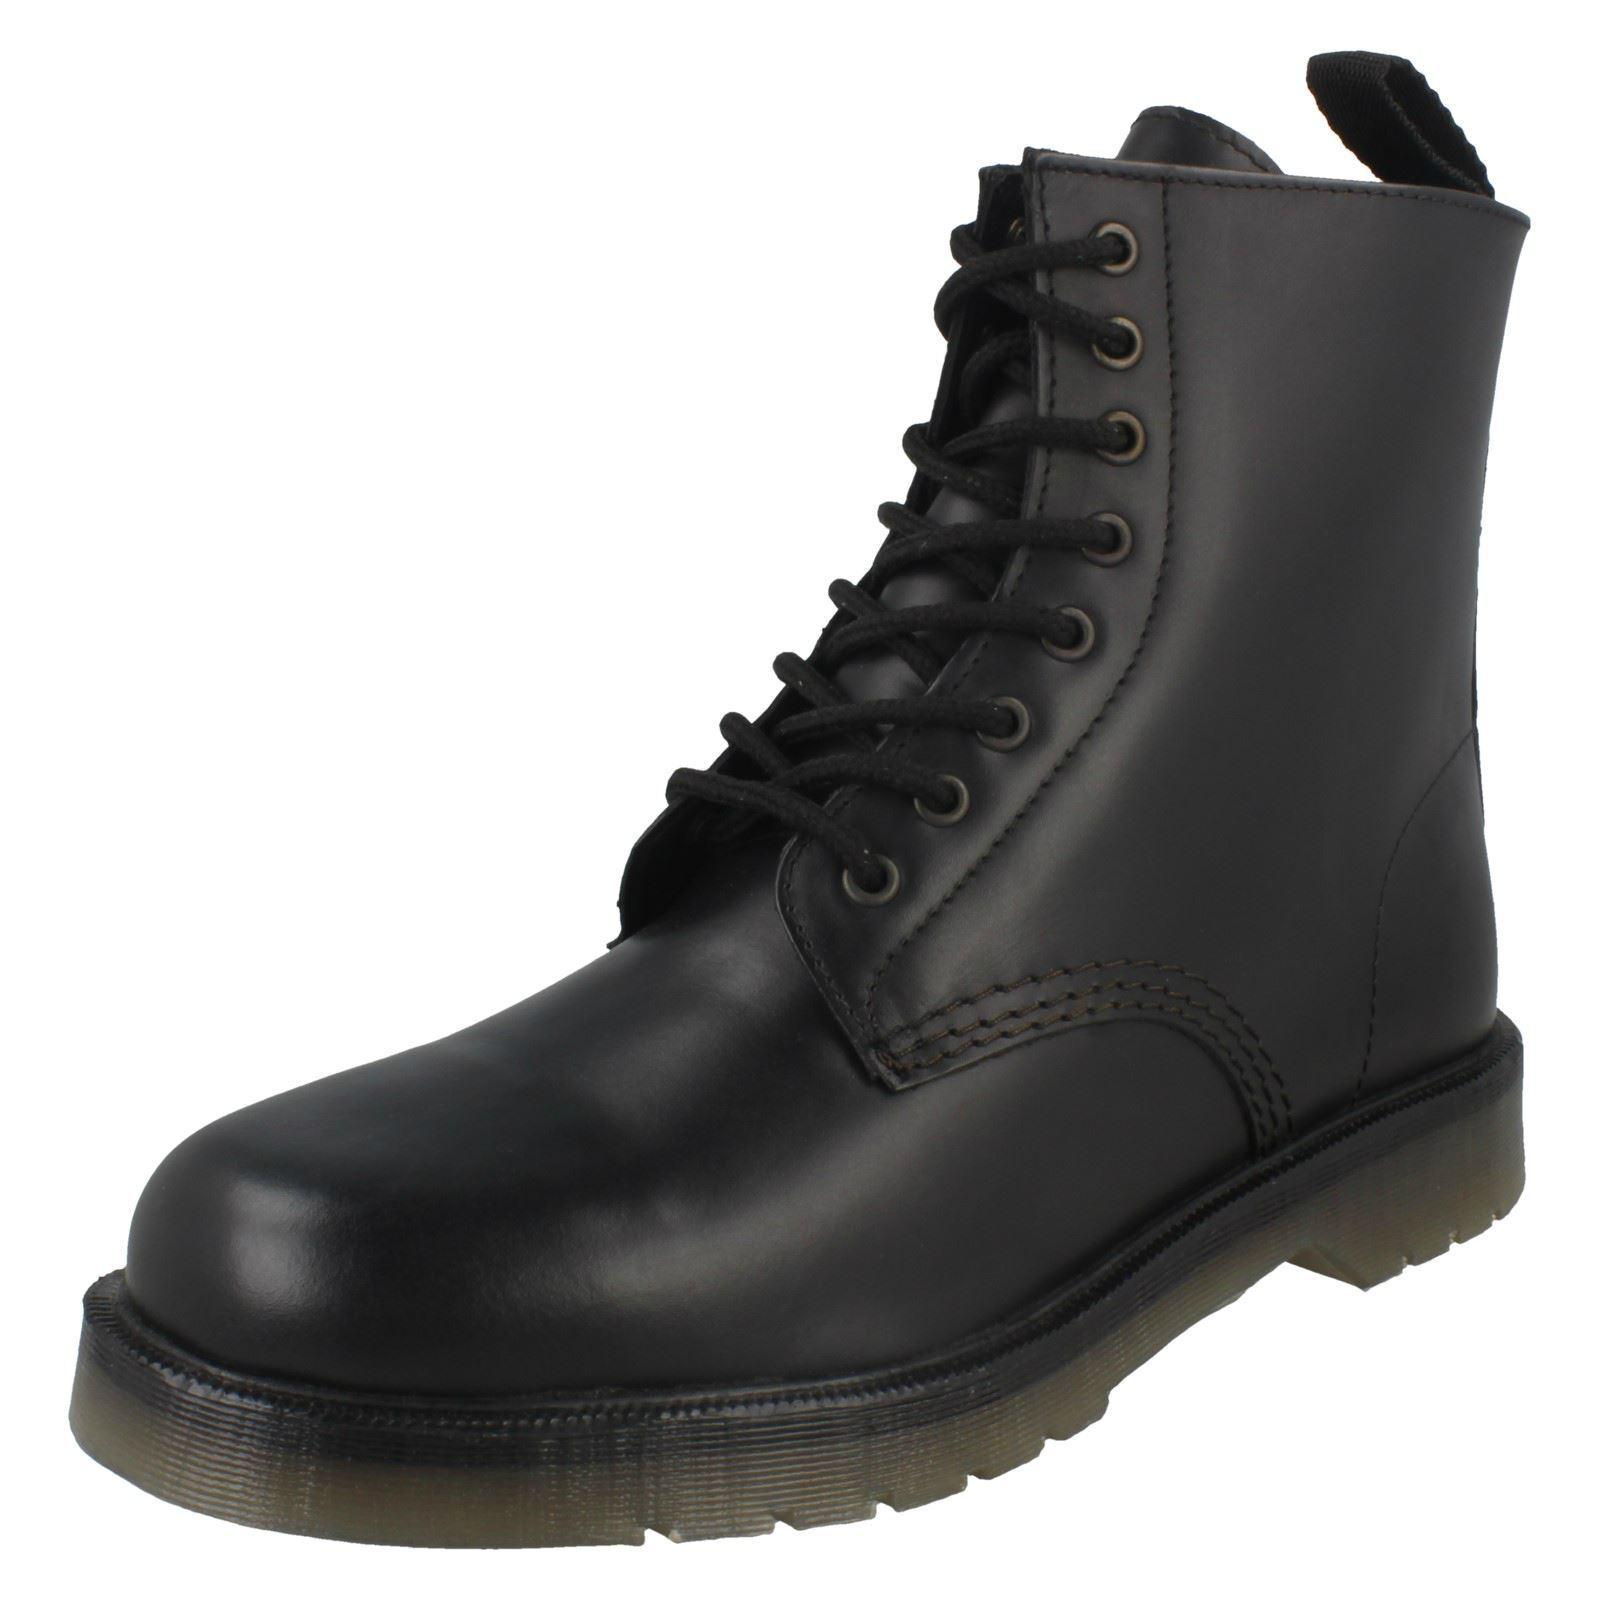 Uomo Maverick Military Style Style Military Stiefel cb4849